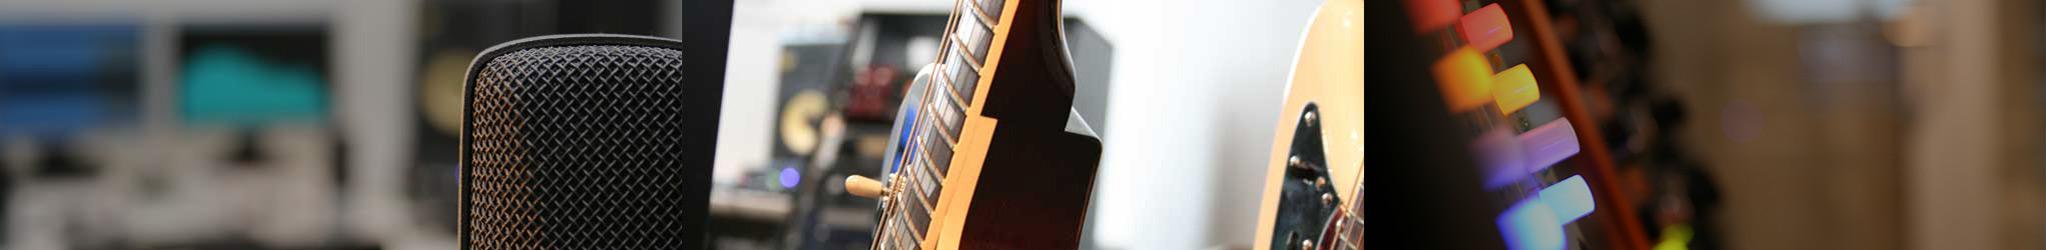 Slider-Soundfabrik-kontakt-1